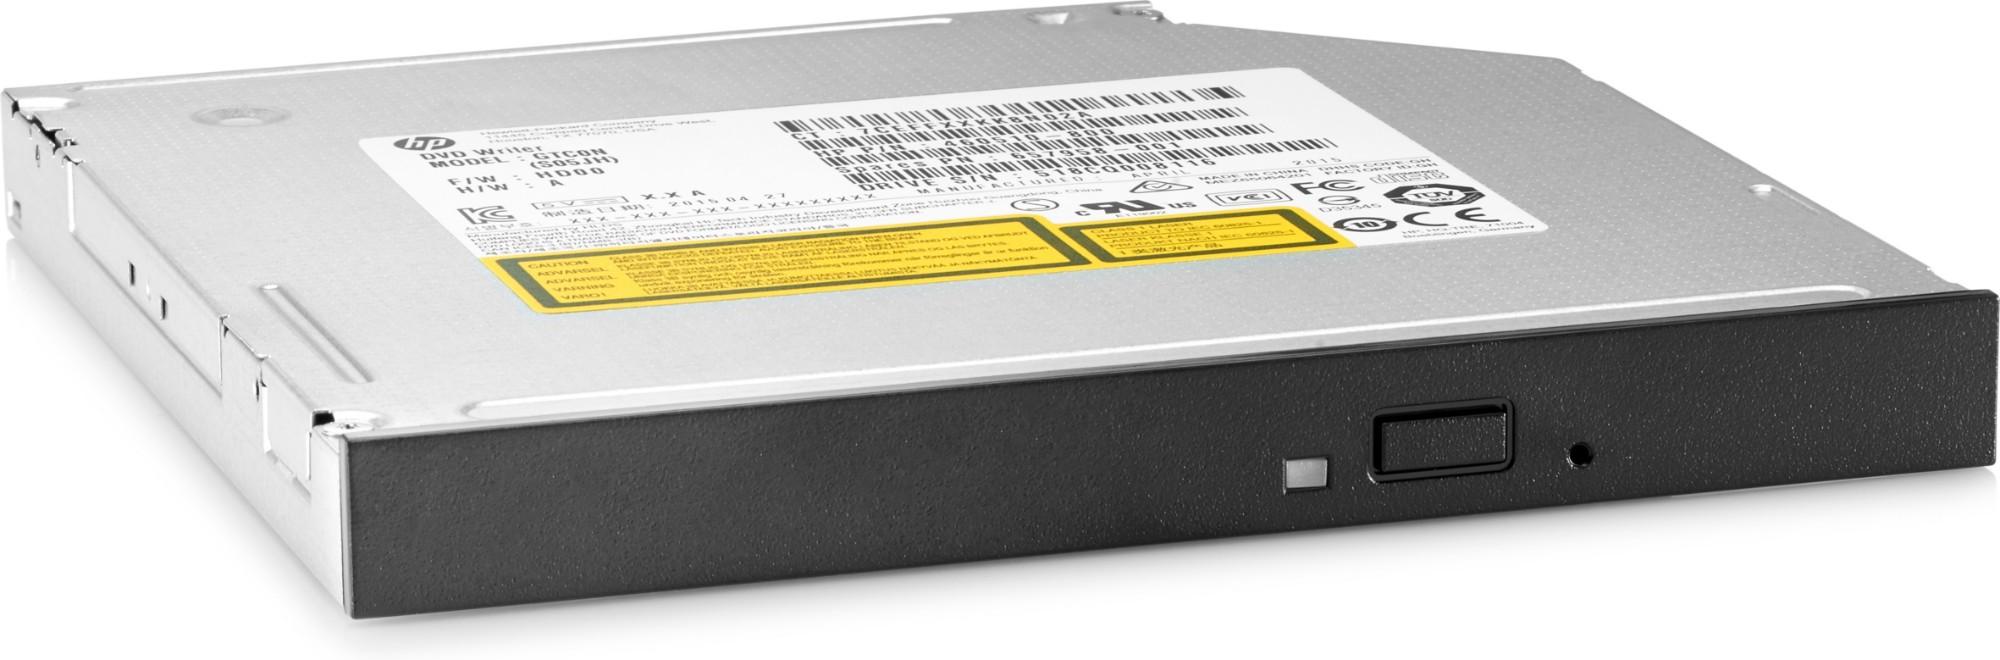 HP 9.5mm AIO 705/800 G2 Slim DVD Writer (N3S10AA)